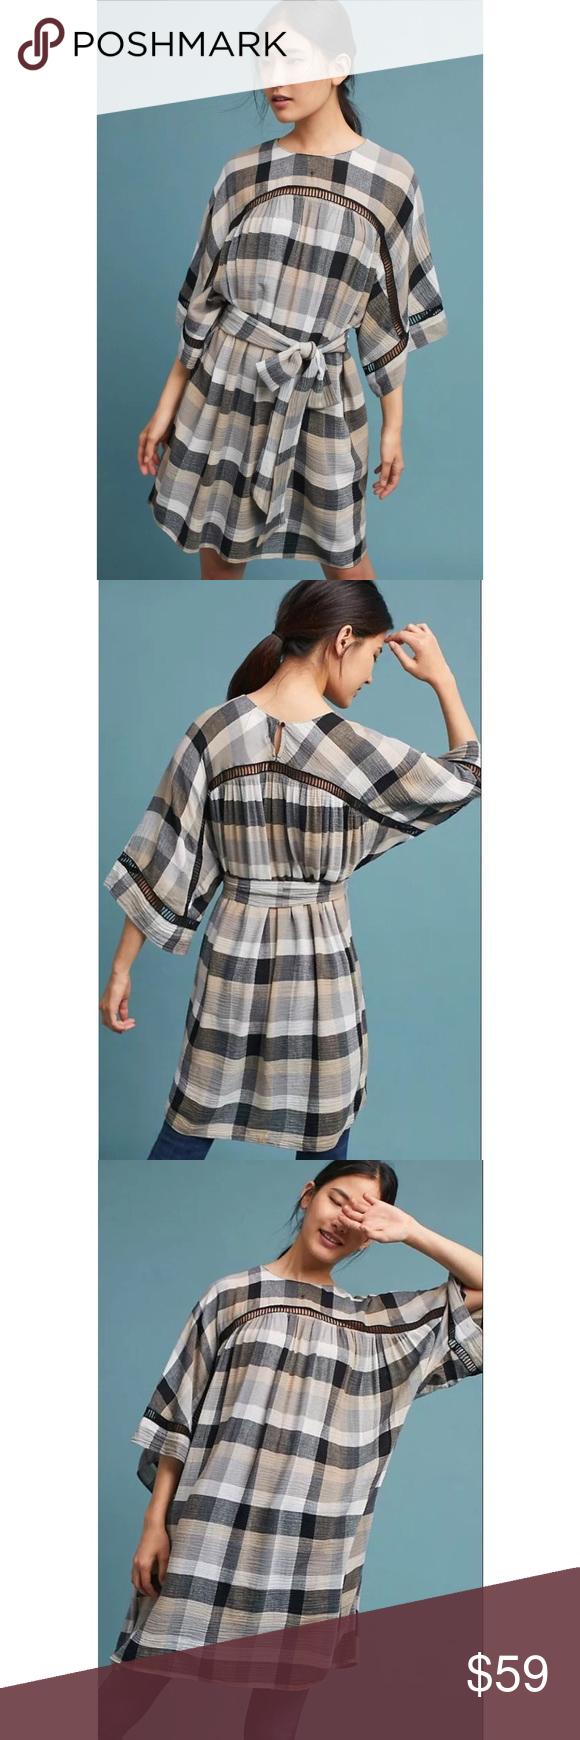 b6316e53ac7c NEW Anthropologie Tie-Waist Kimono Tunic Dress | Plaid tunic, Floppy ...